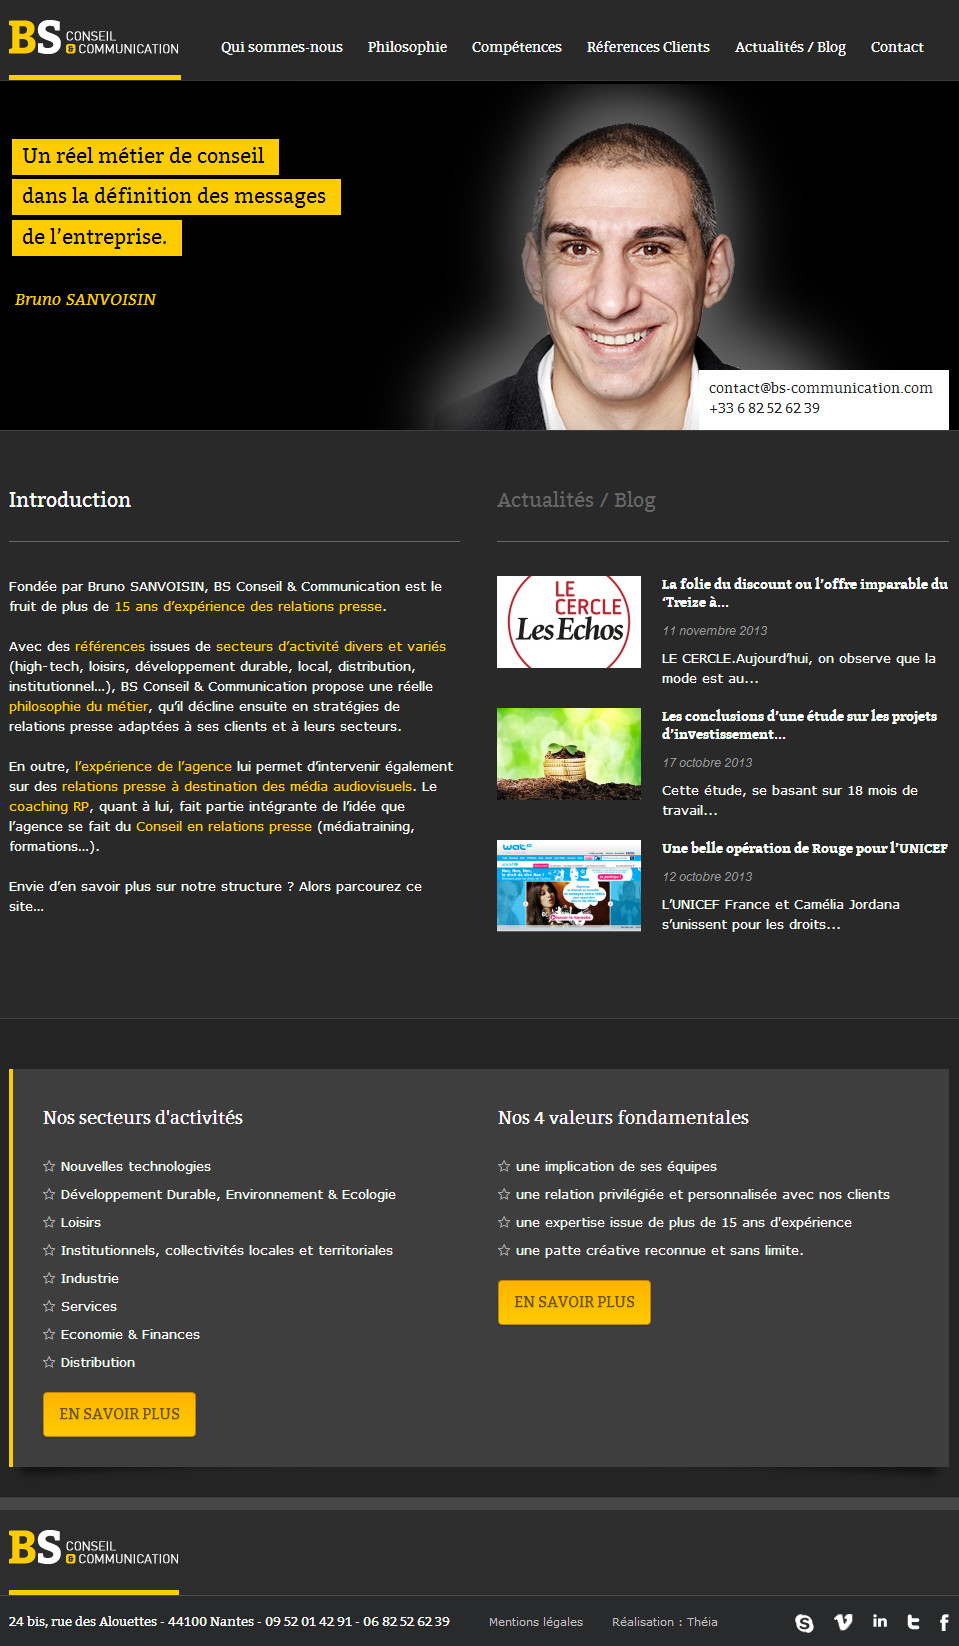 BS Conseil & Communication